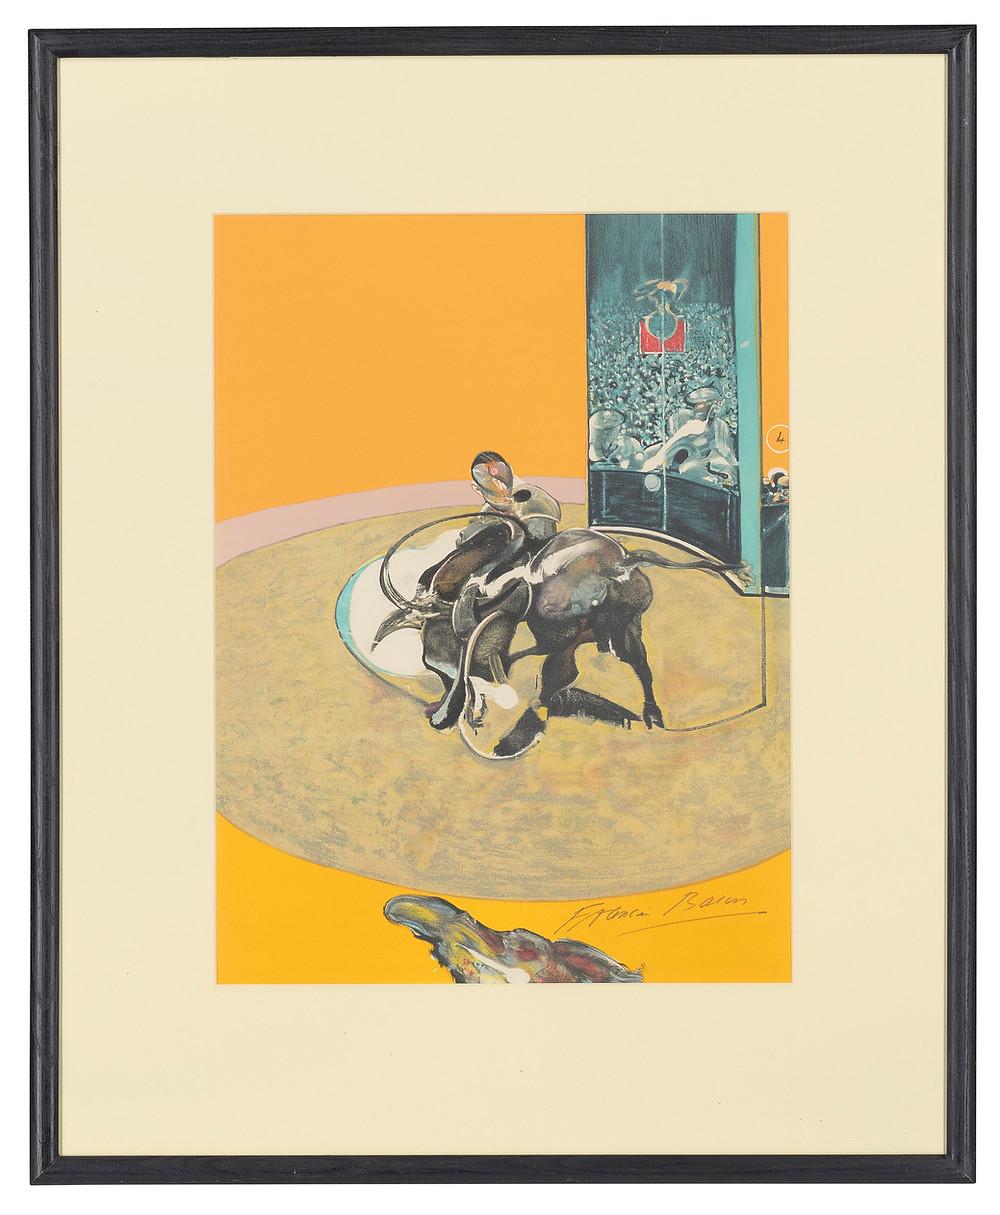 FRANCIS BACON (1909-1992)   One print, from: Miroir de la Tauromachie. royal history . sale at christies.com